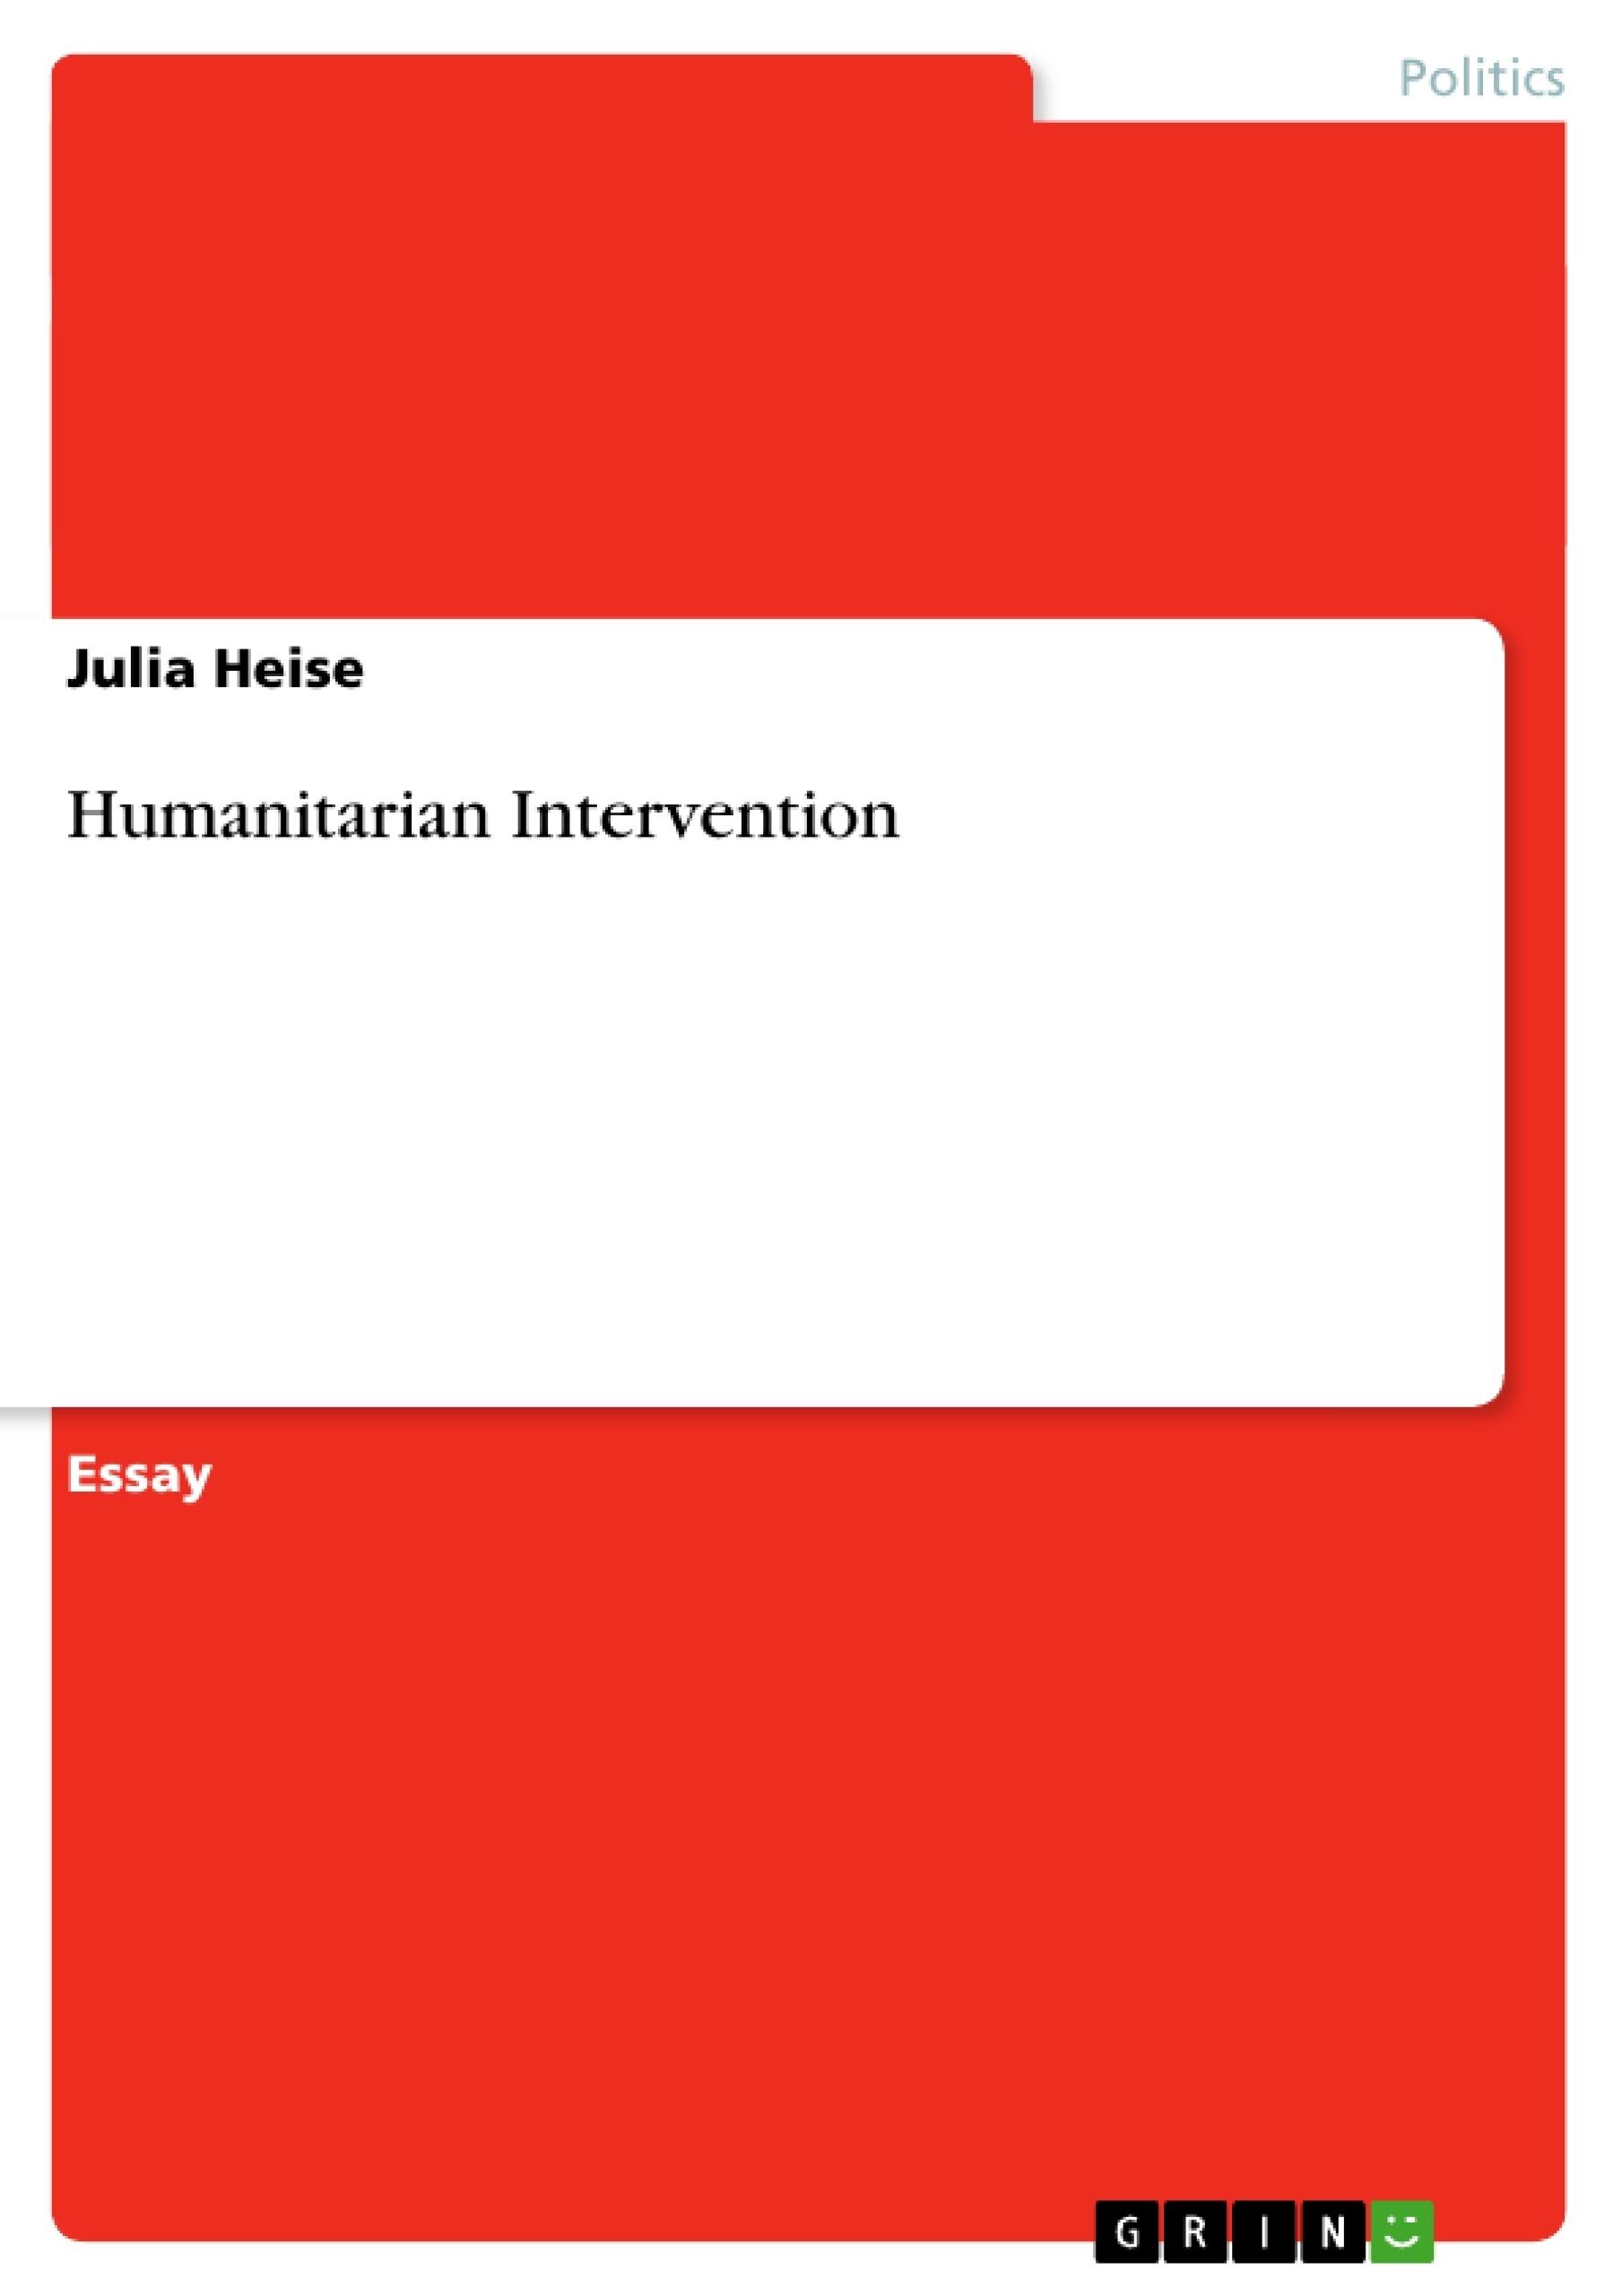 Title: Humanitarian Intervention